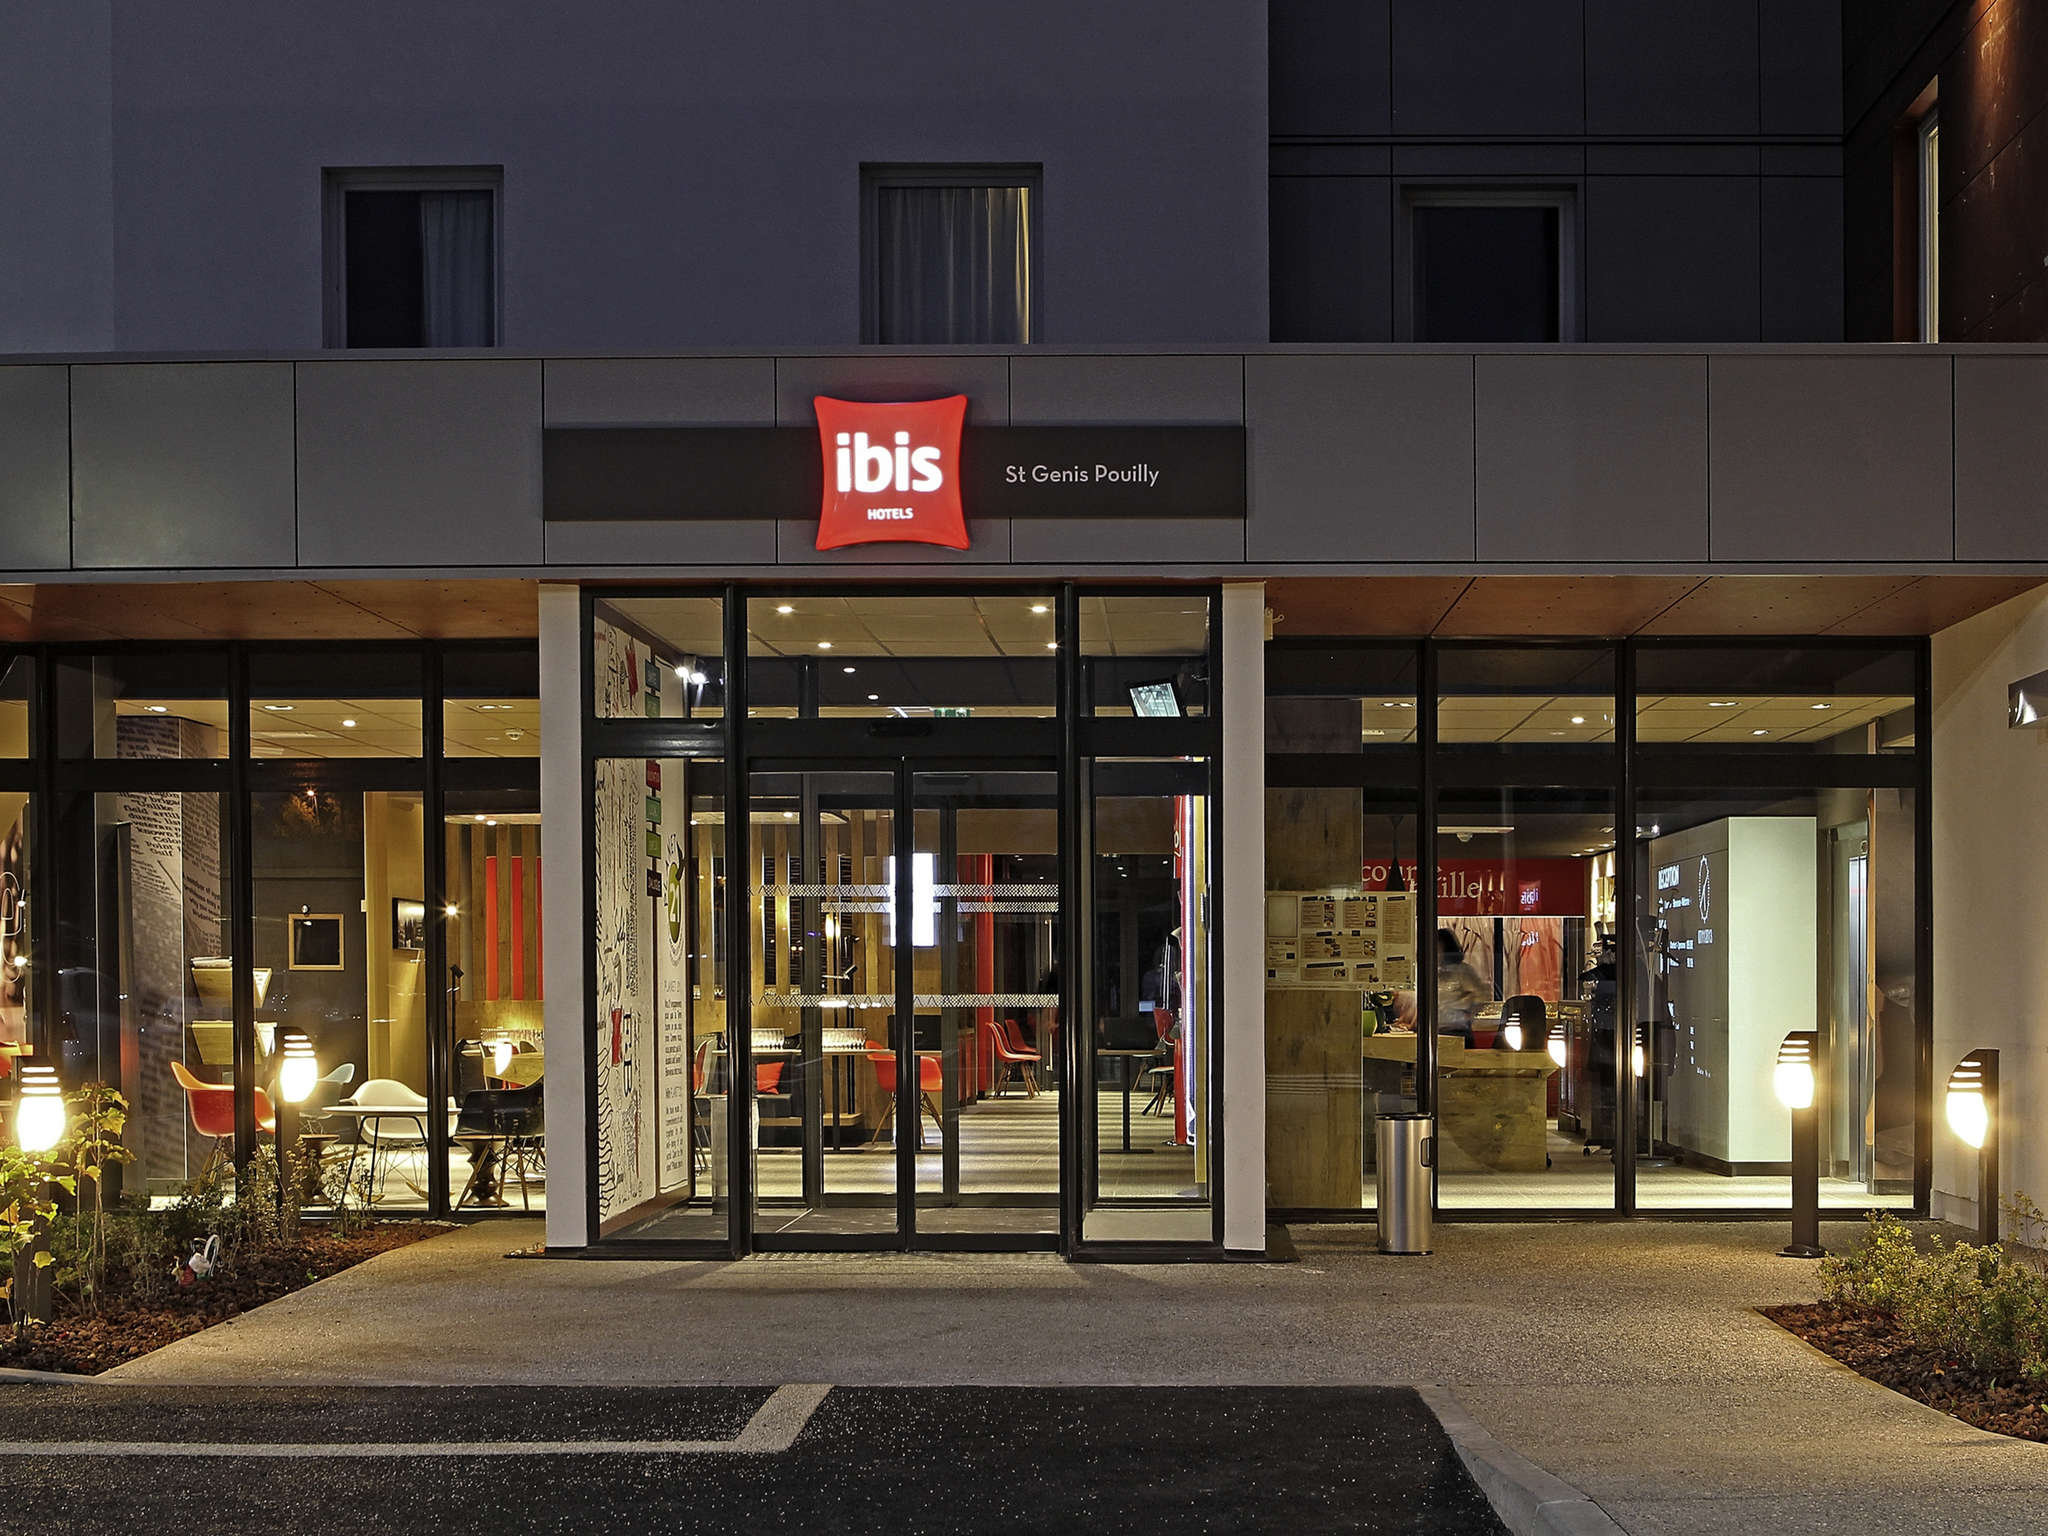 Hotel – ibis Saint Genis Pouilly Genève